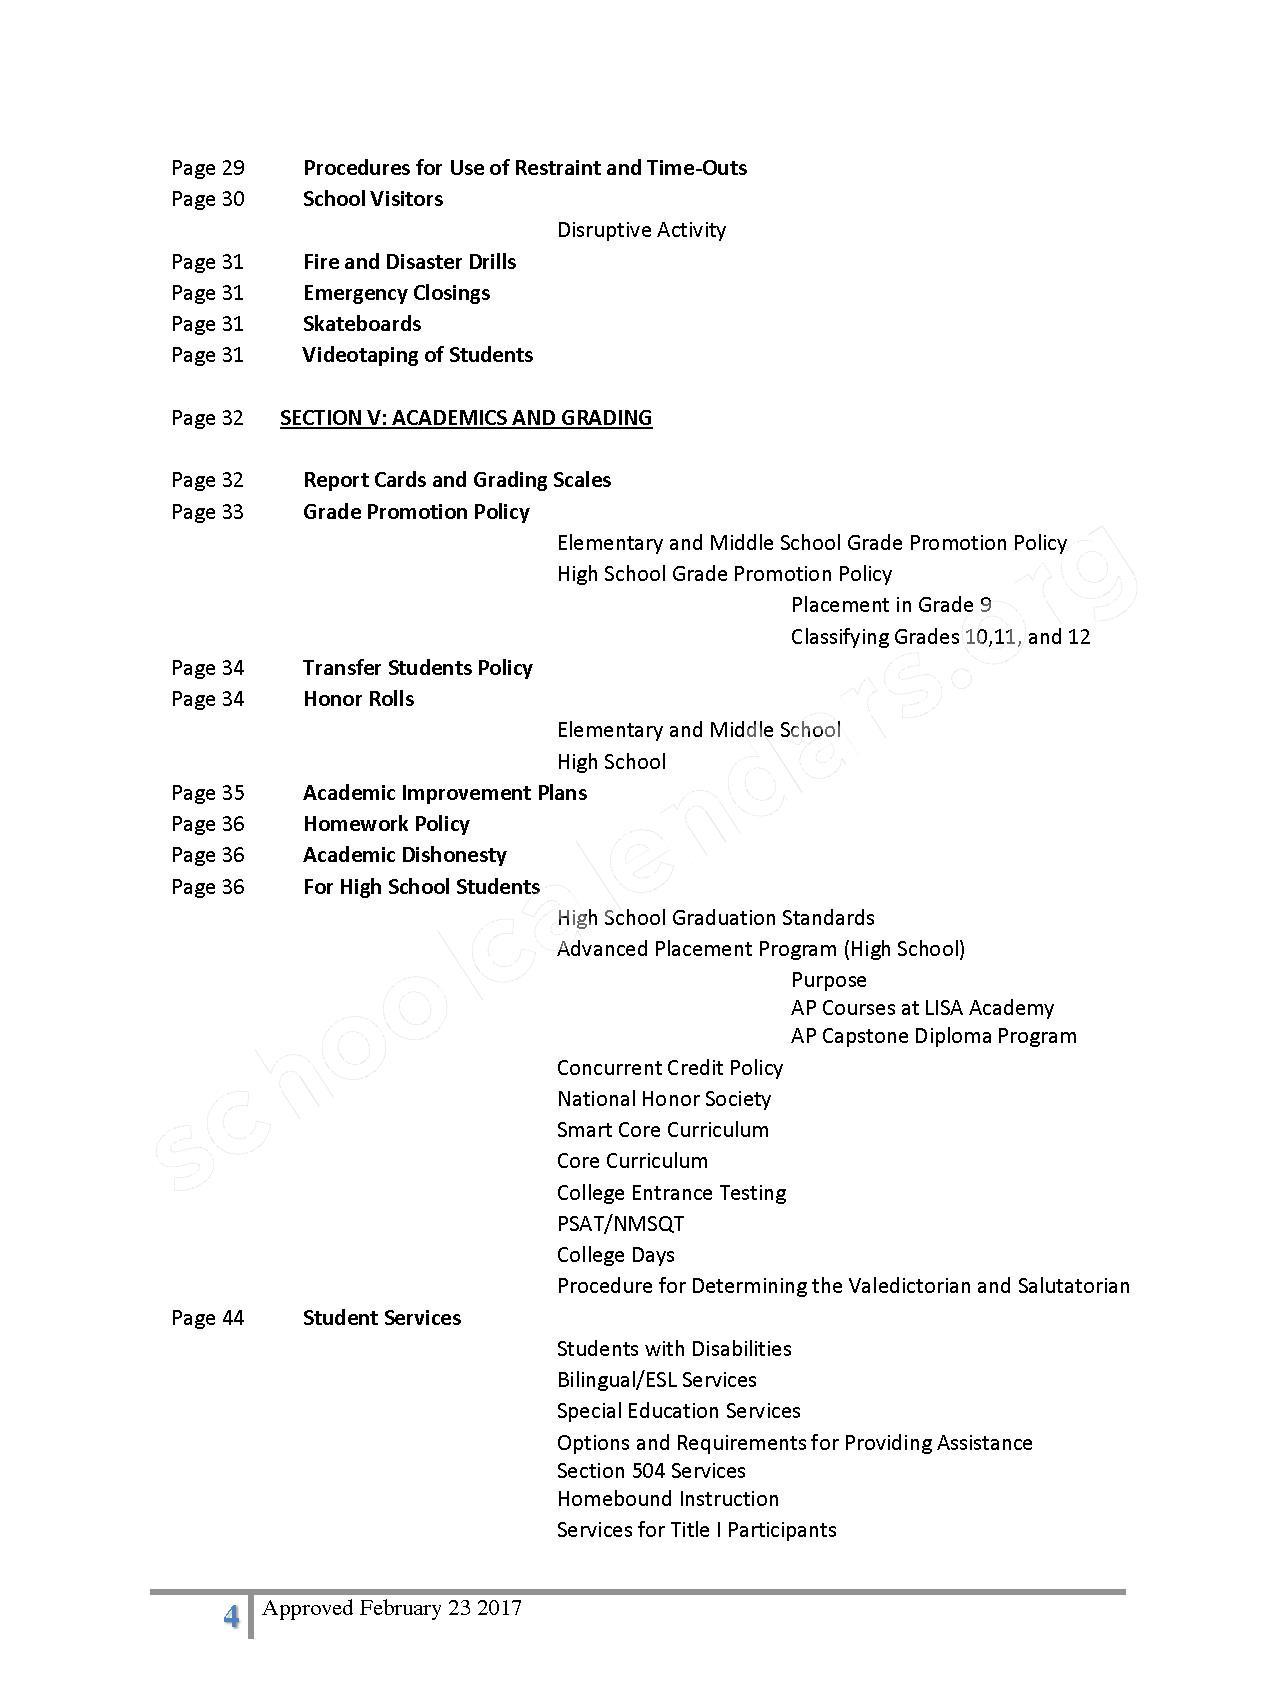 2016 - 2017 District Calendar – Lisa Academy Public Charter Schools – page 4